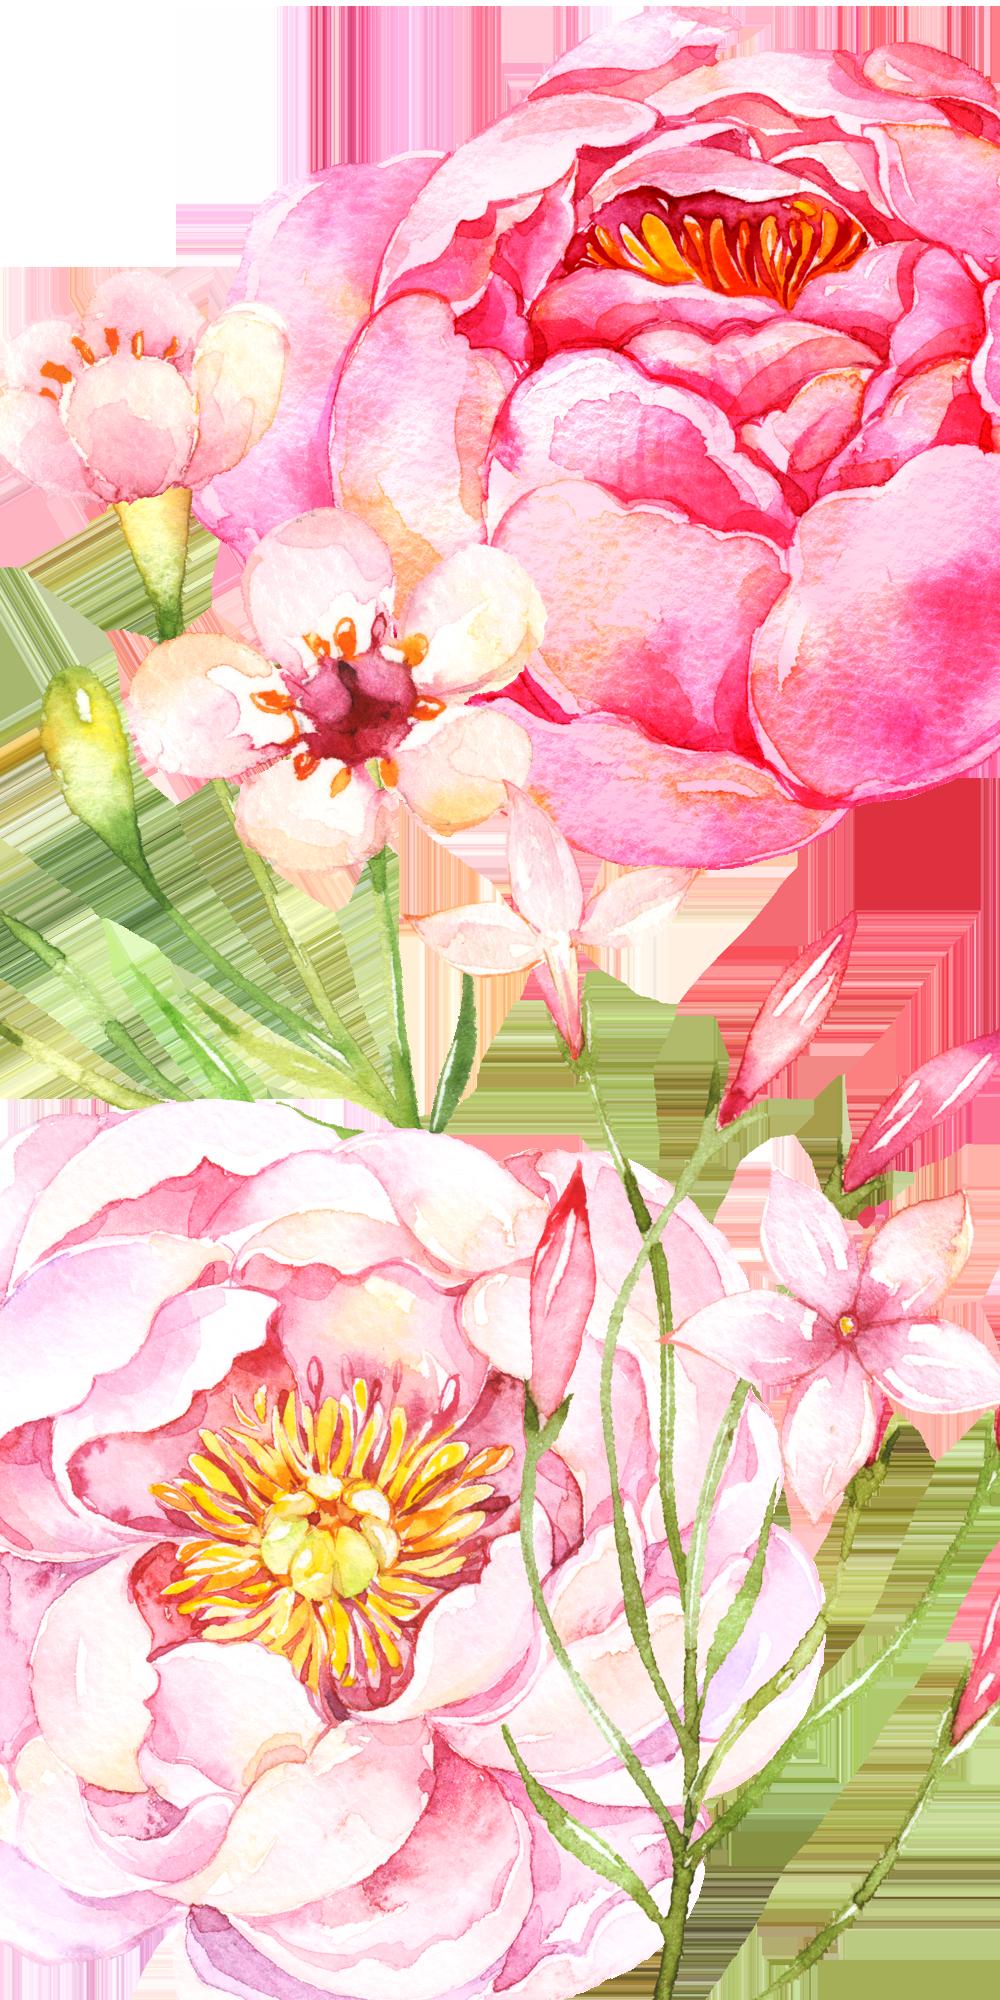 Pink Peonies Casetify Iphone Art Design Flowers Floral Floral Watercolor Flower Drawing Watercolor Flowers